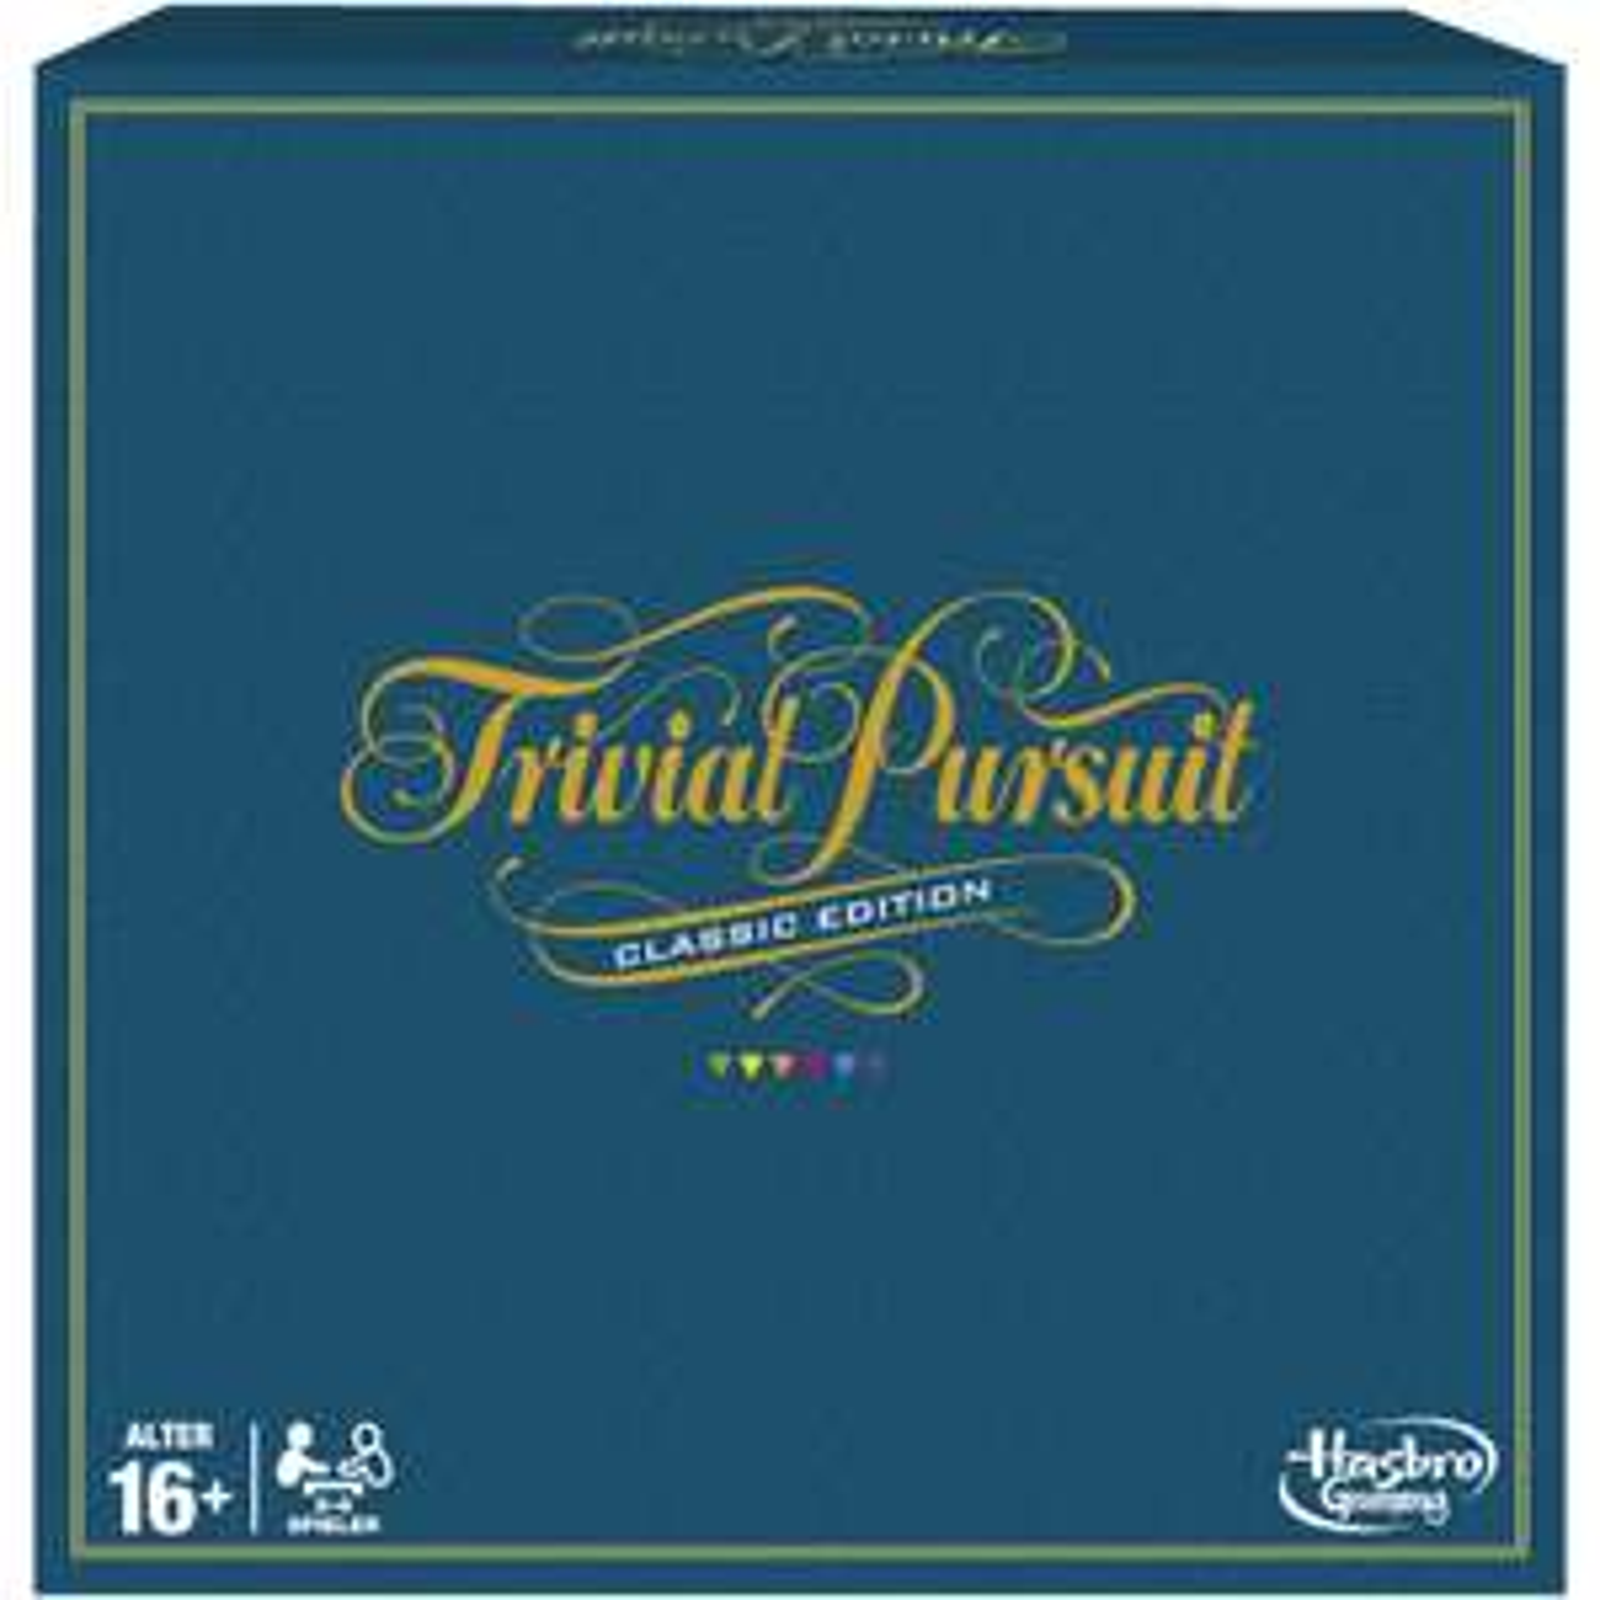 Hasbro Trivial Pursuit - Classic Edition für 8,10€ & LEGO Juniors - Gebirgspolizei auf Verfolgungsjagd (10751) für 5,40€ (eBay)